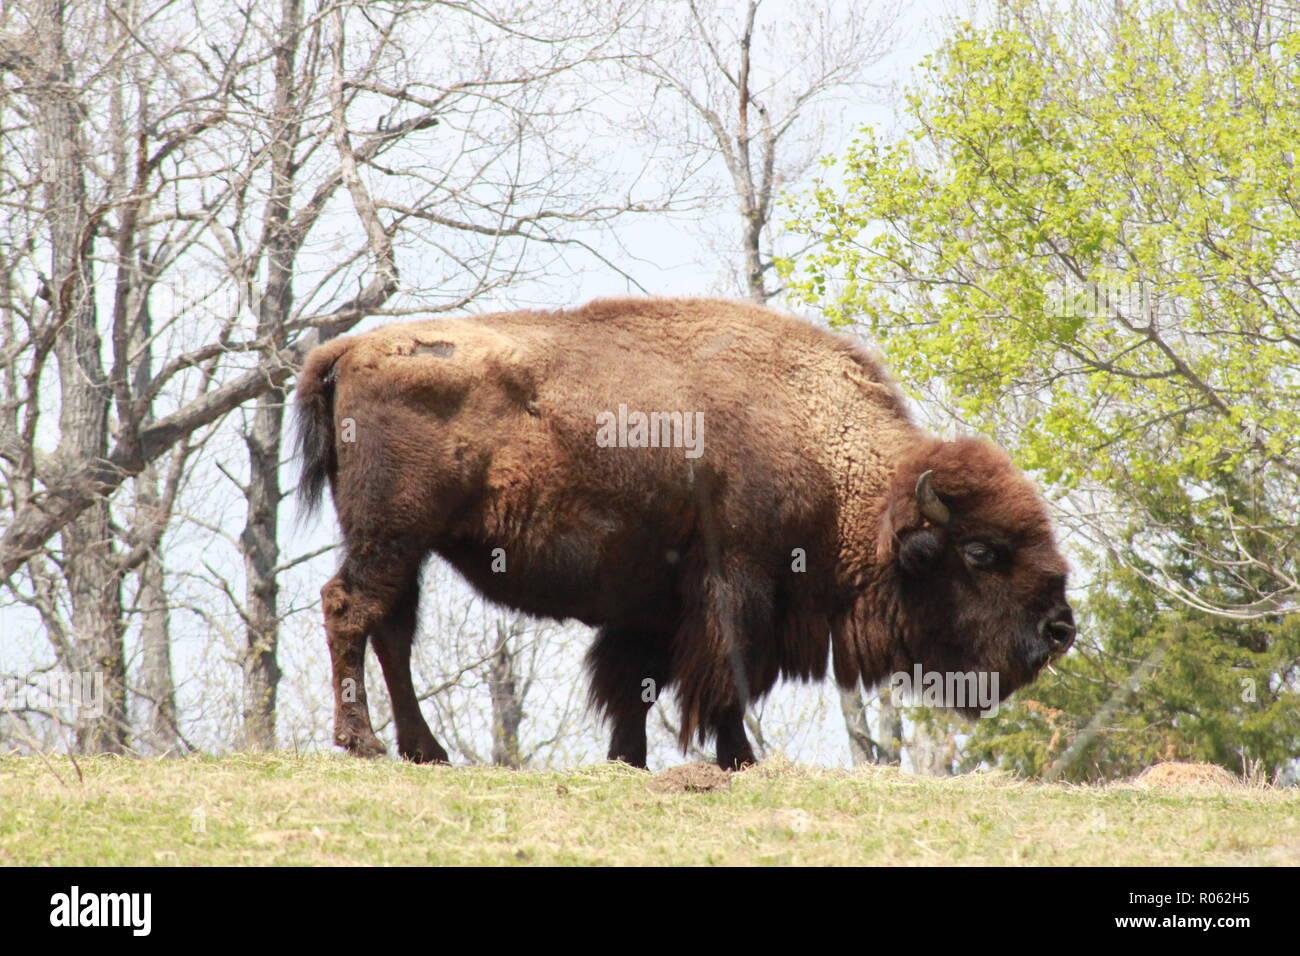 American Buffalo standing at the North Carolina Zoological Park in Asheboro, NC - Stock Image